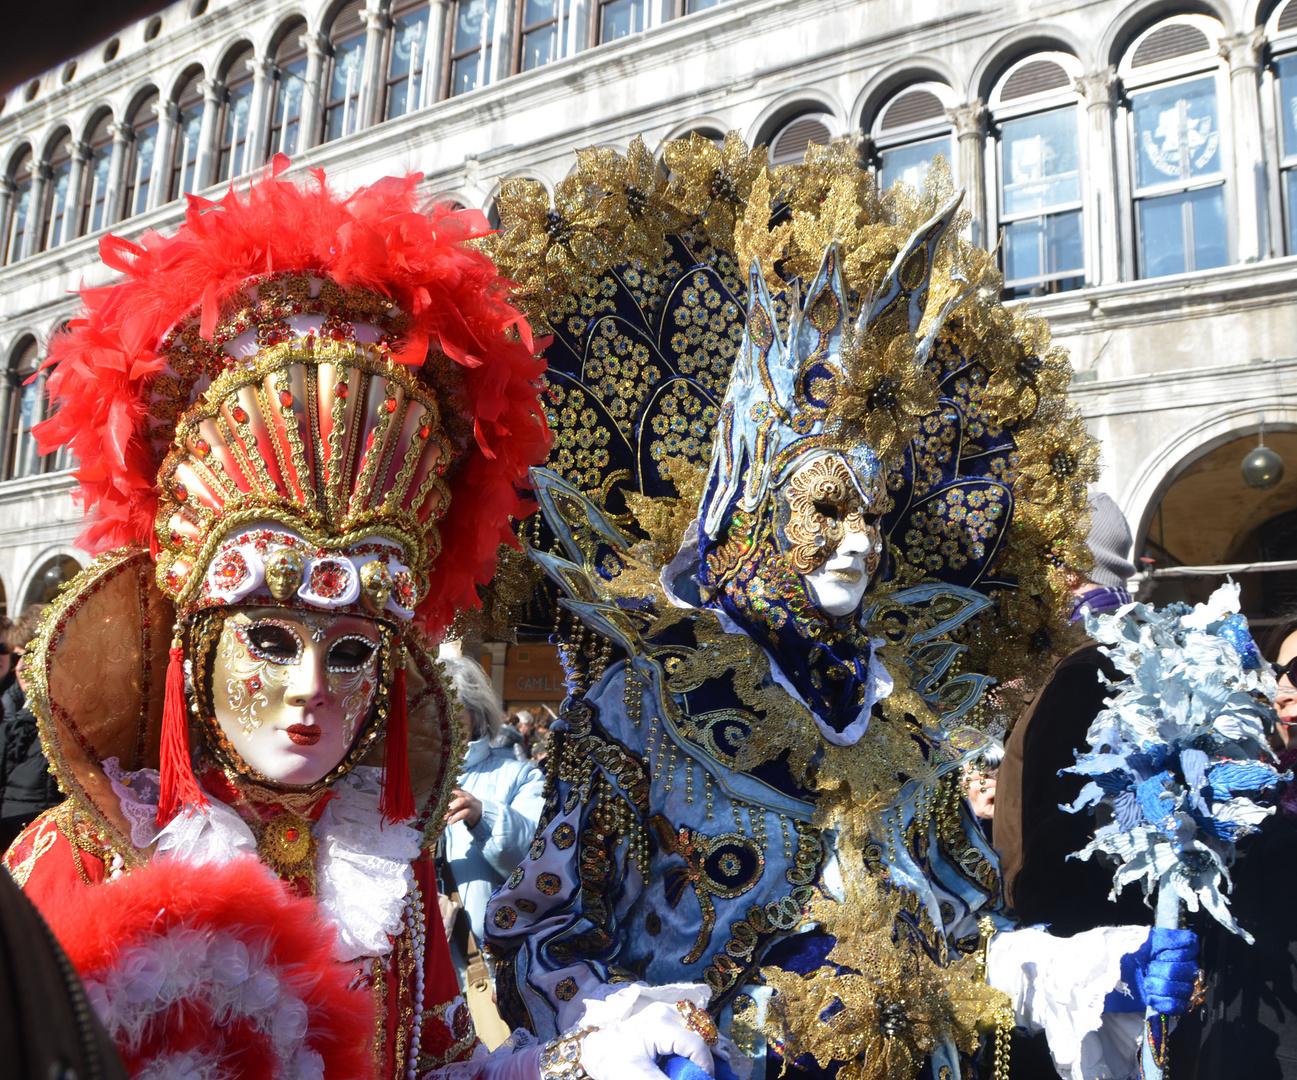 karneval in venedig 6 foto bild europe italy vatican city s marino italy bilder auf. Black Bedroom Furniture Sets. Home Design Ideas